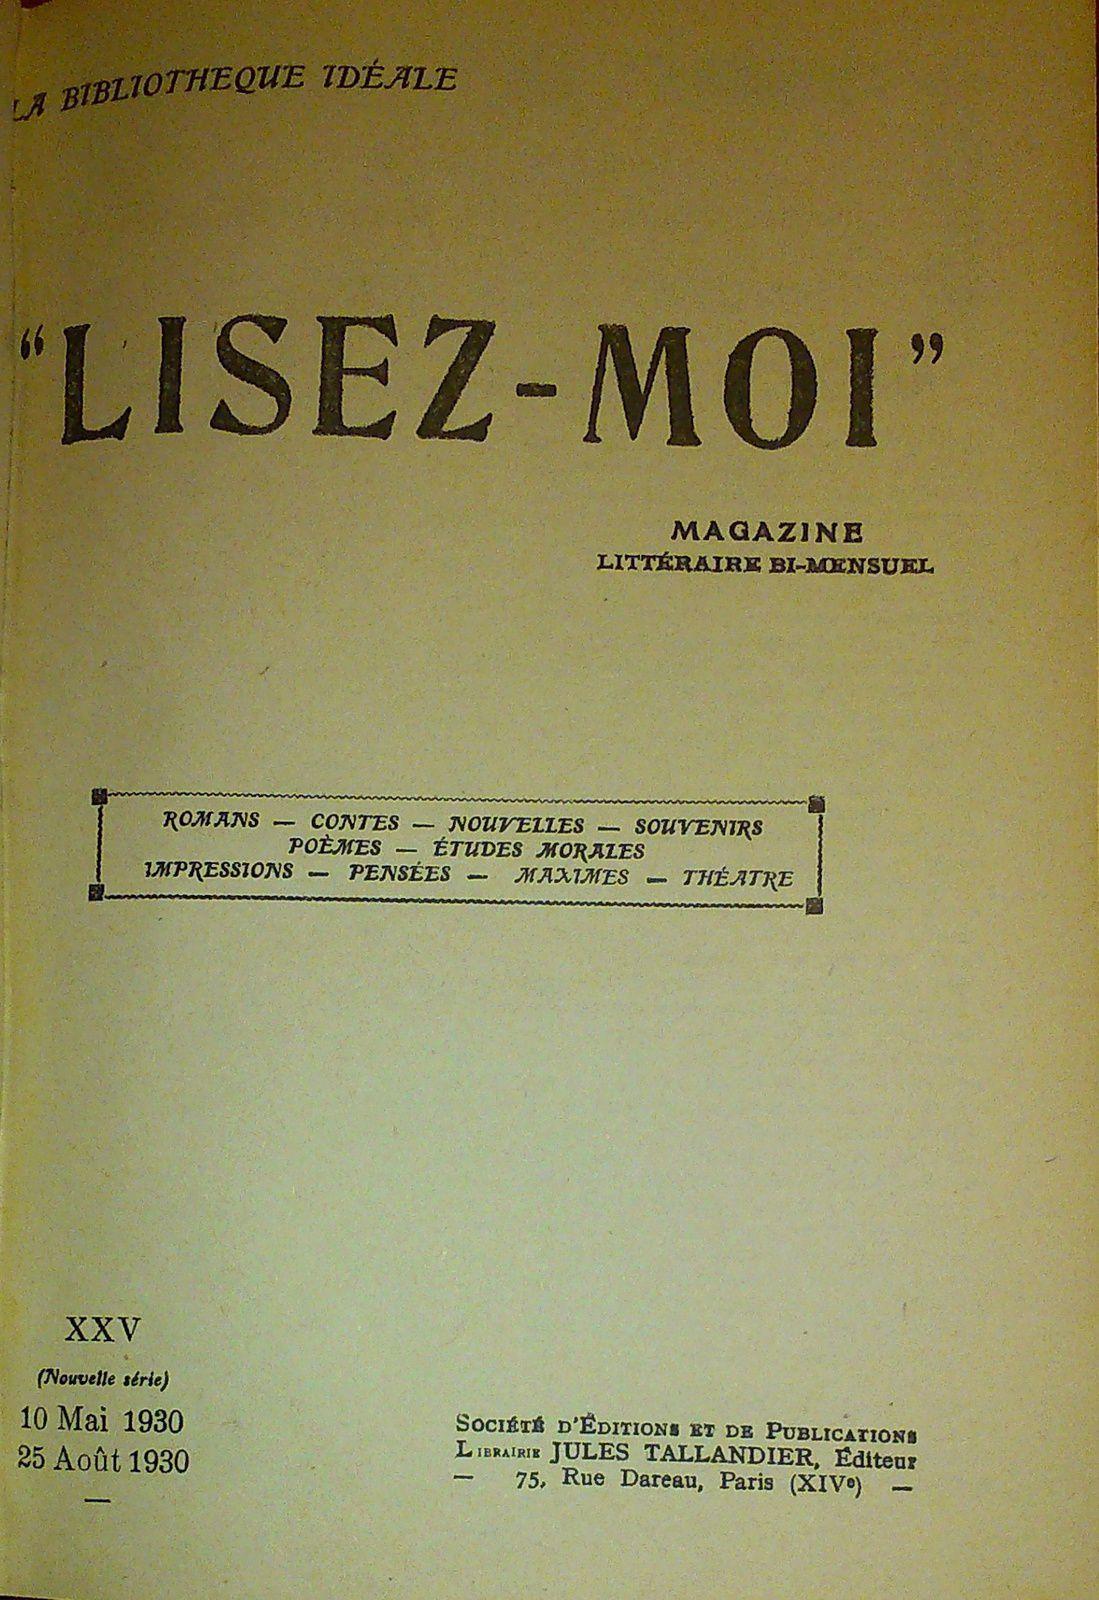 Lisez-Moi (Nouvelle série) - Reliure n°XXIV n°197-208 (1930)